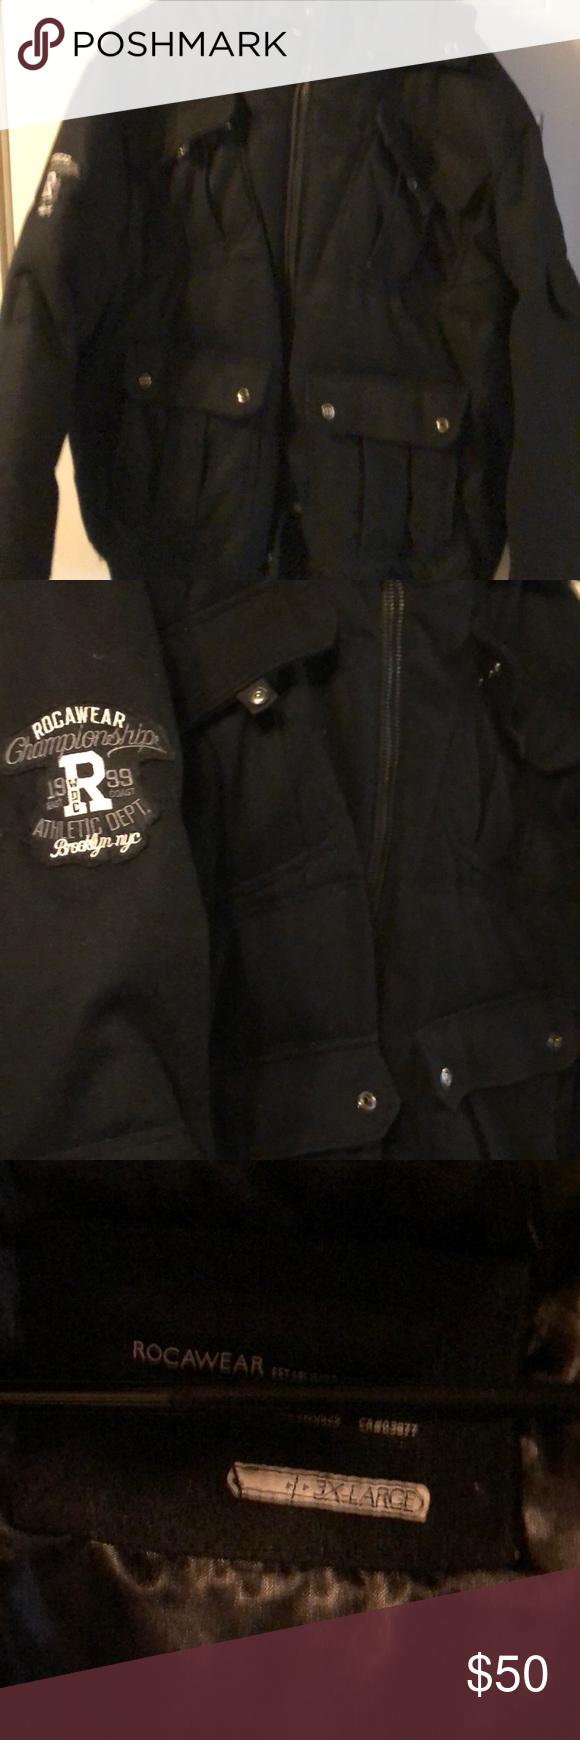 Rocawear Wool Winter Jacket With Hood Sz Xxxl Wool Winter Jacket Jackets Winter Jackets [ 1740 x 580 Pixel ]